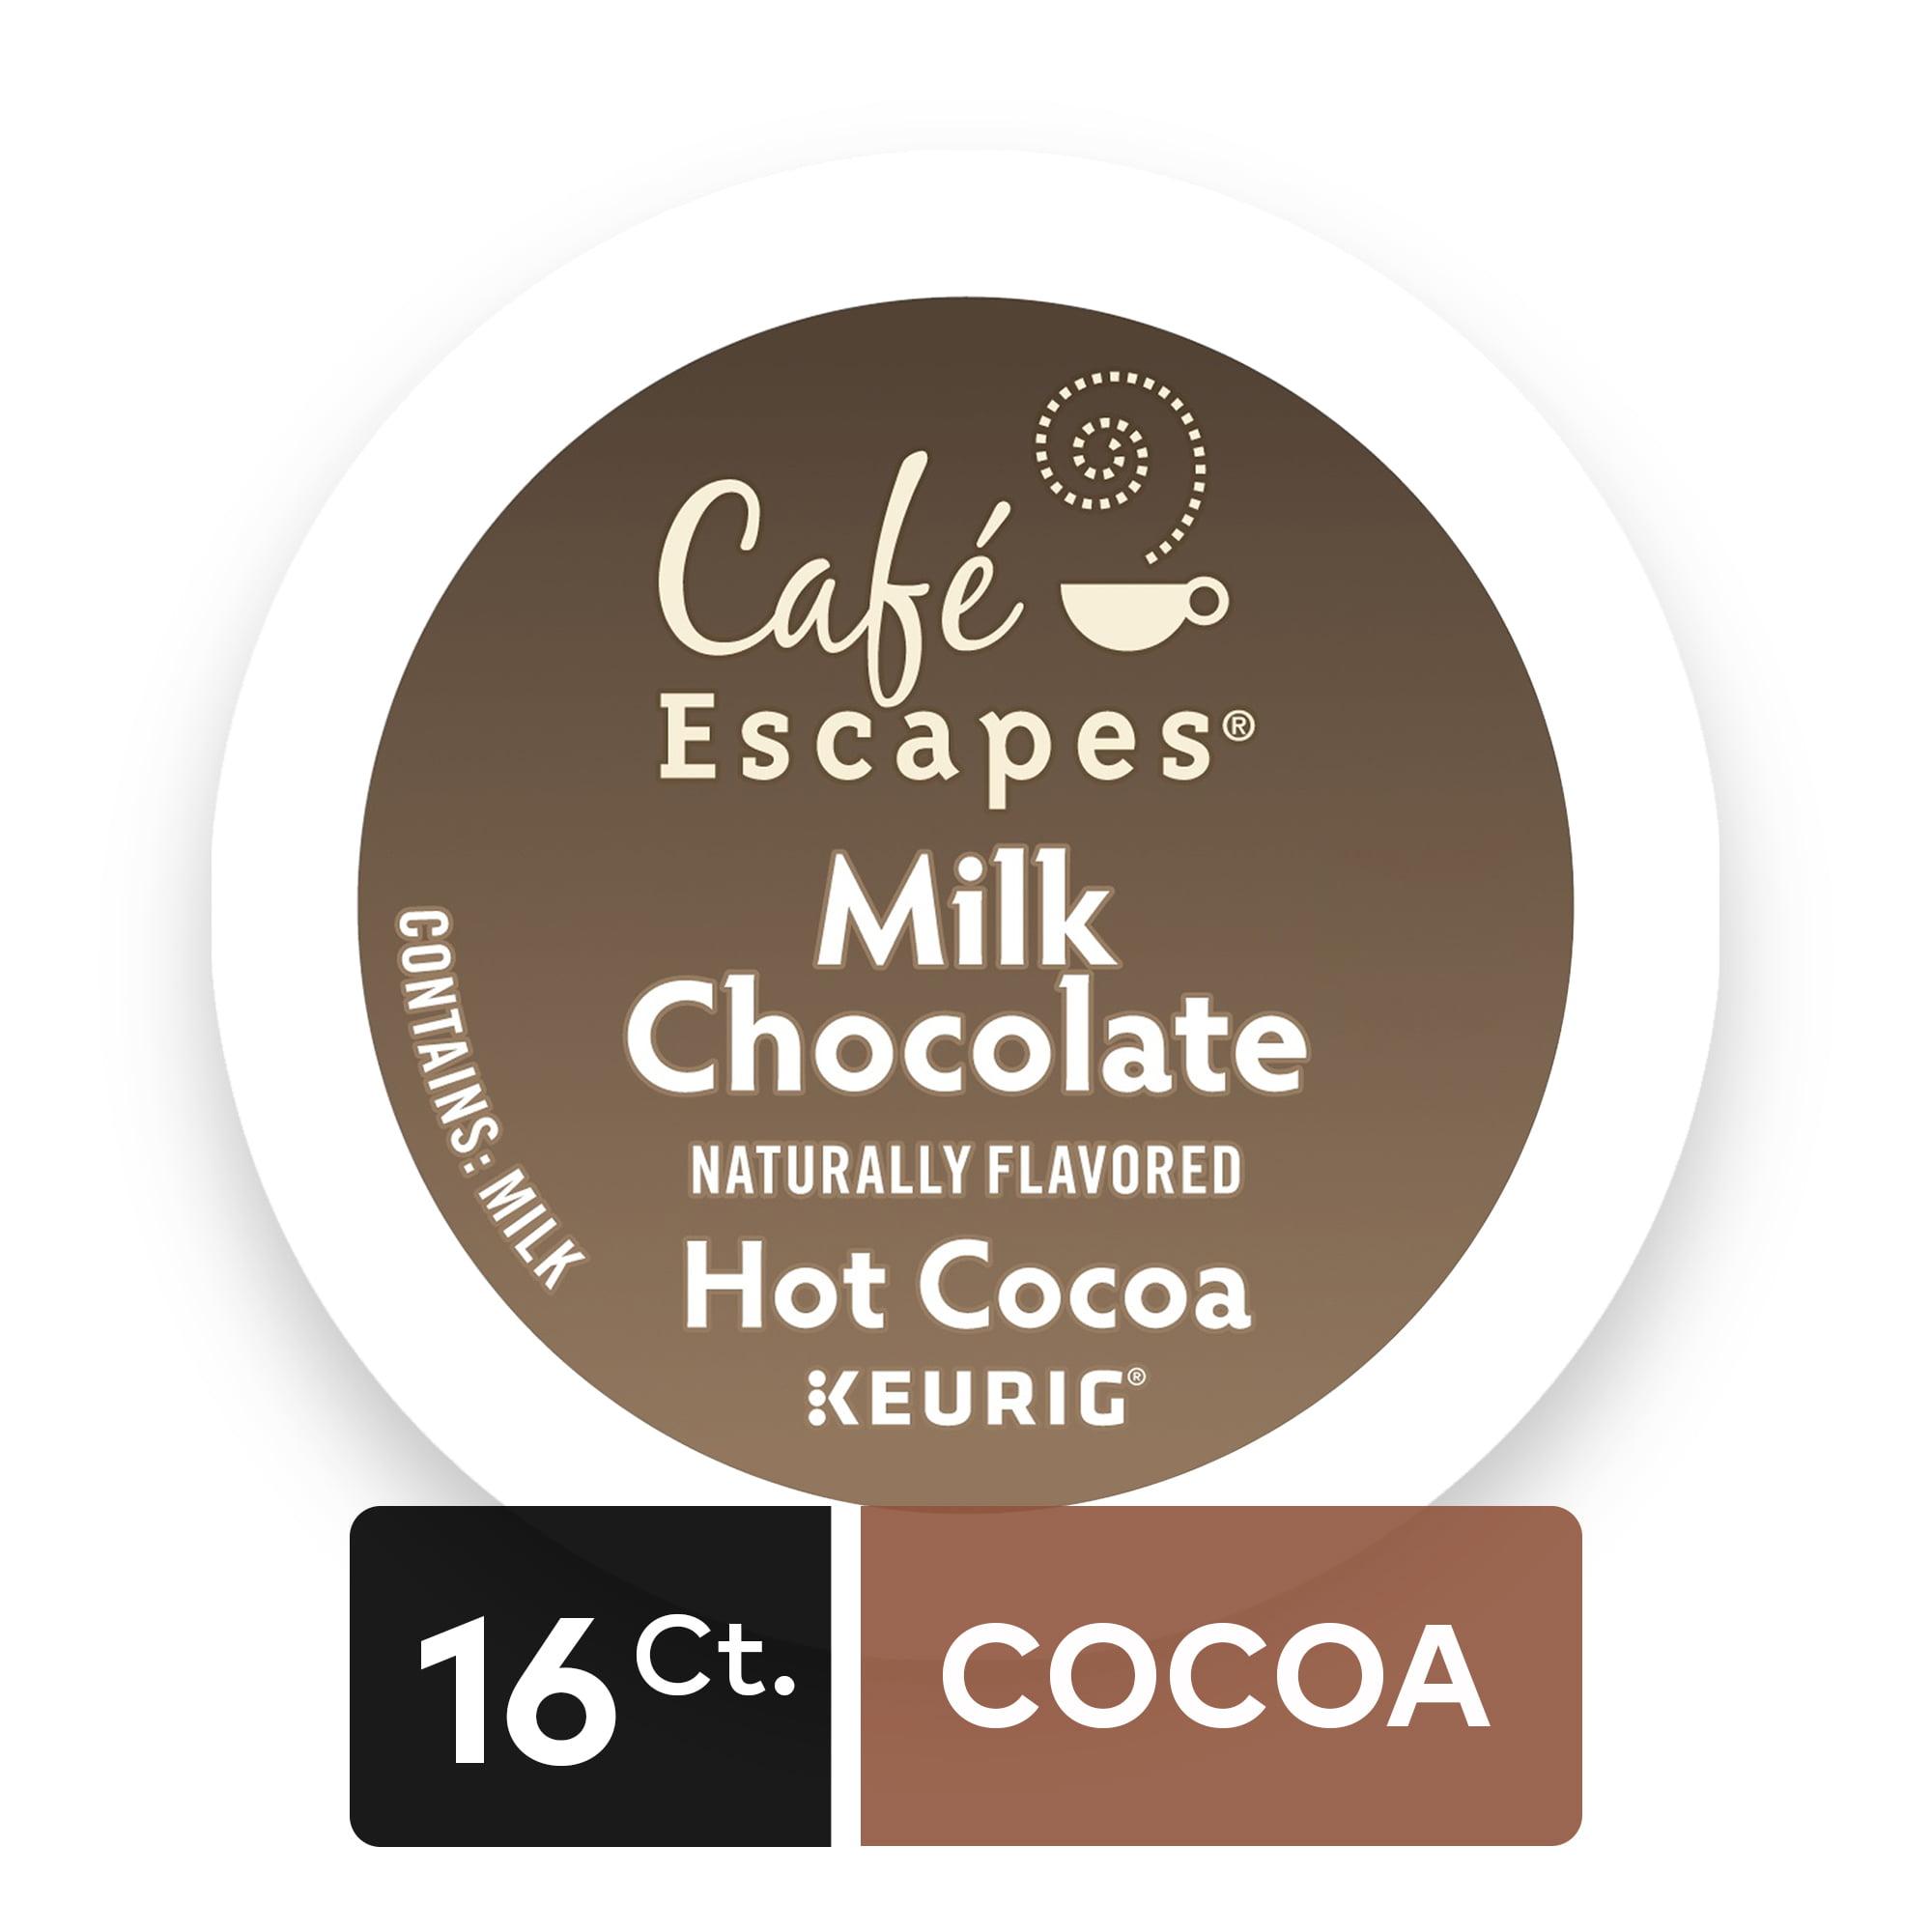 Café Escapes Milk Chocolate Hot Cocoa Keurig Single-Serve K-Cup Pods, 16 Count